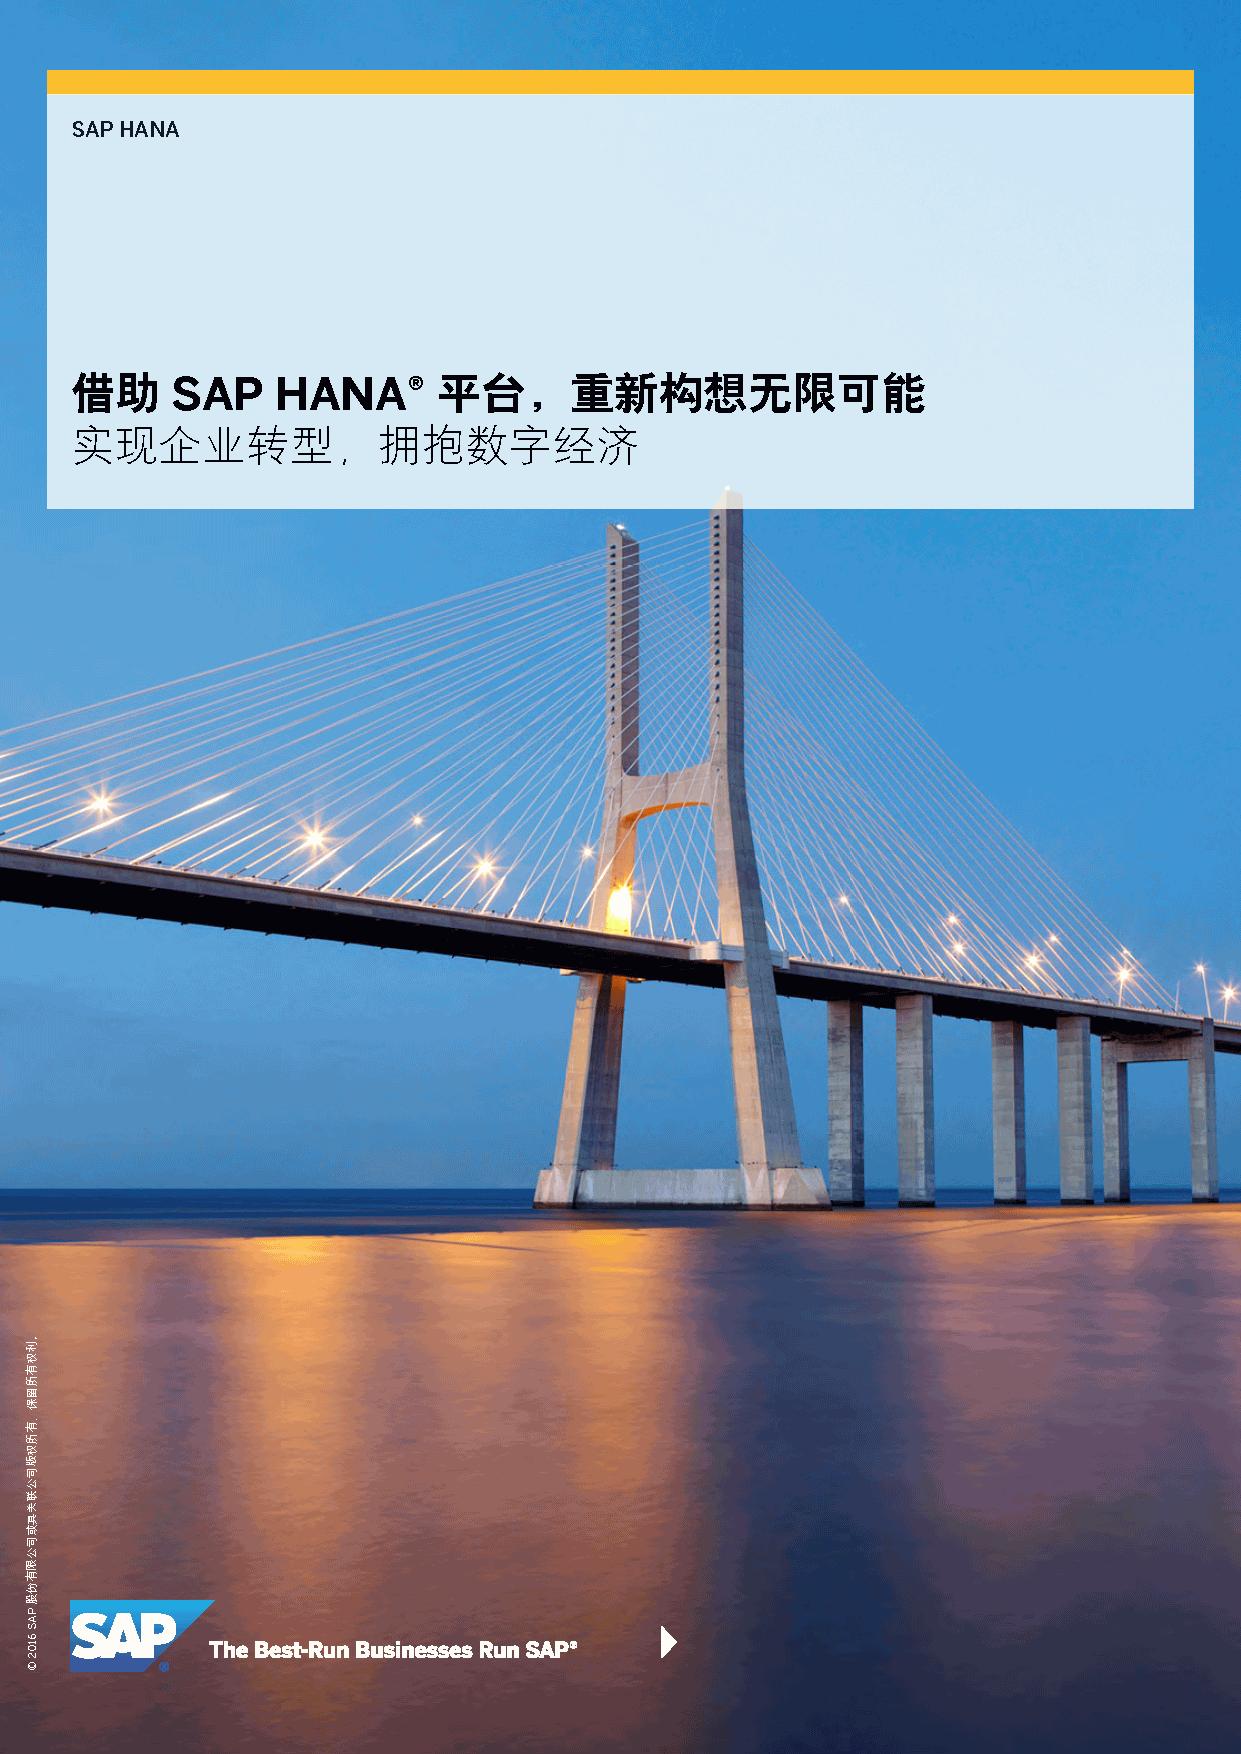 SAP-借助 SAP HANA? 平台,重新构想无限可能